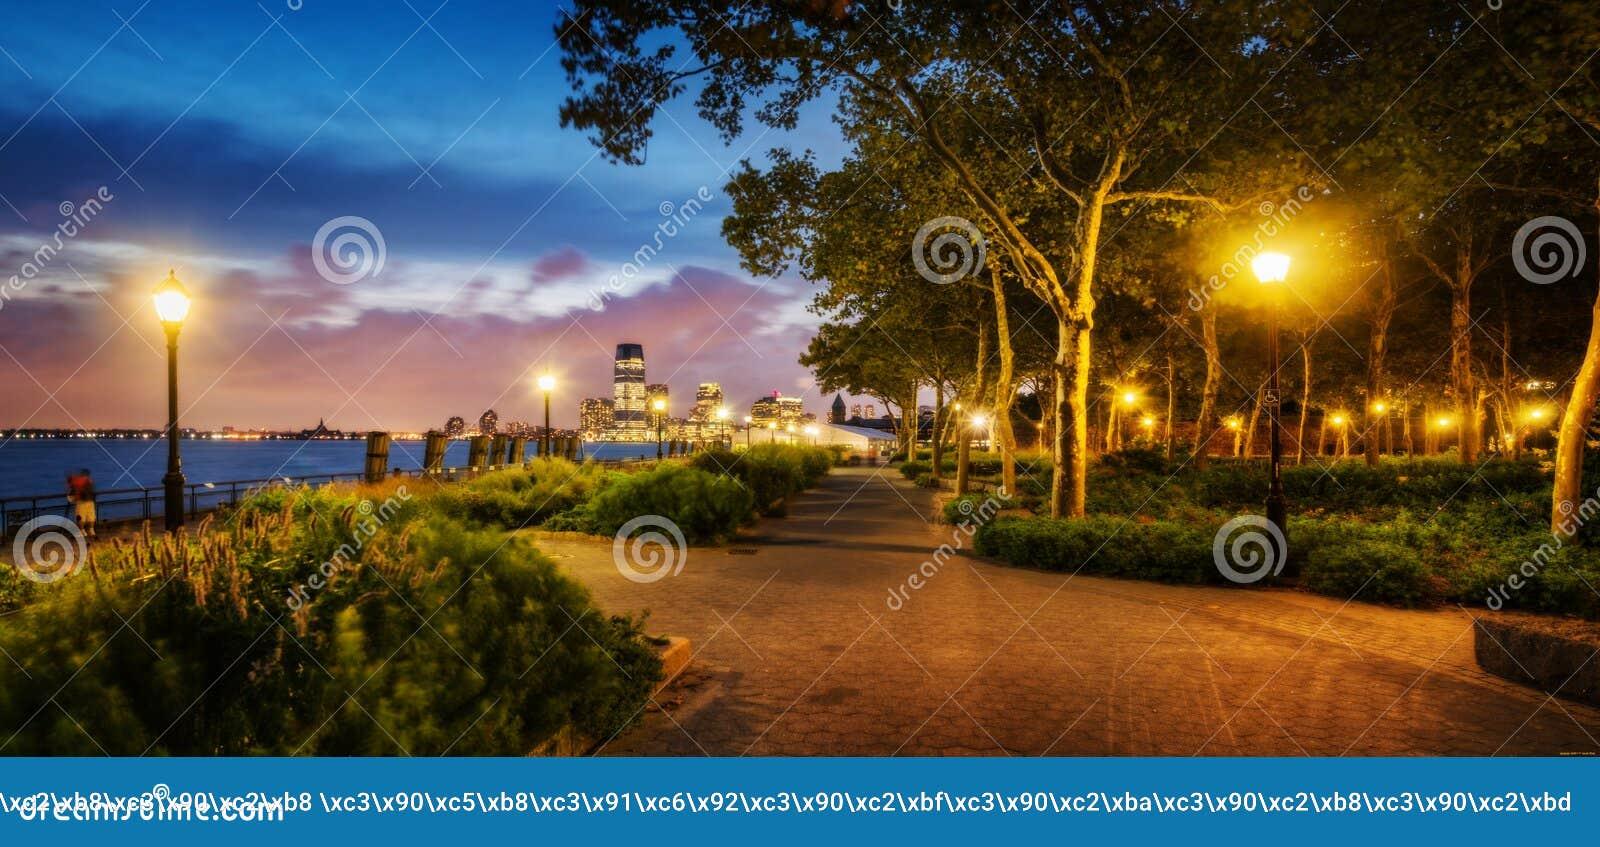 Романтичная дорожка прогулки